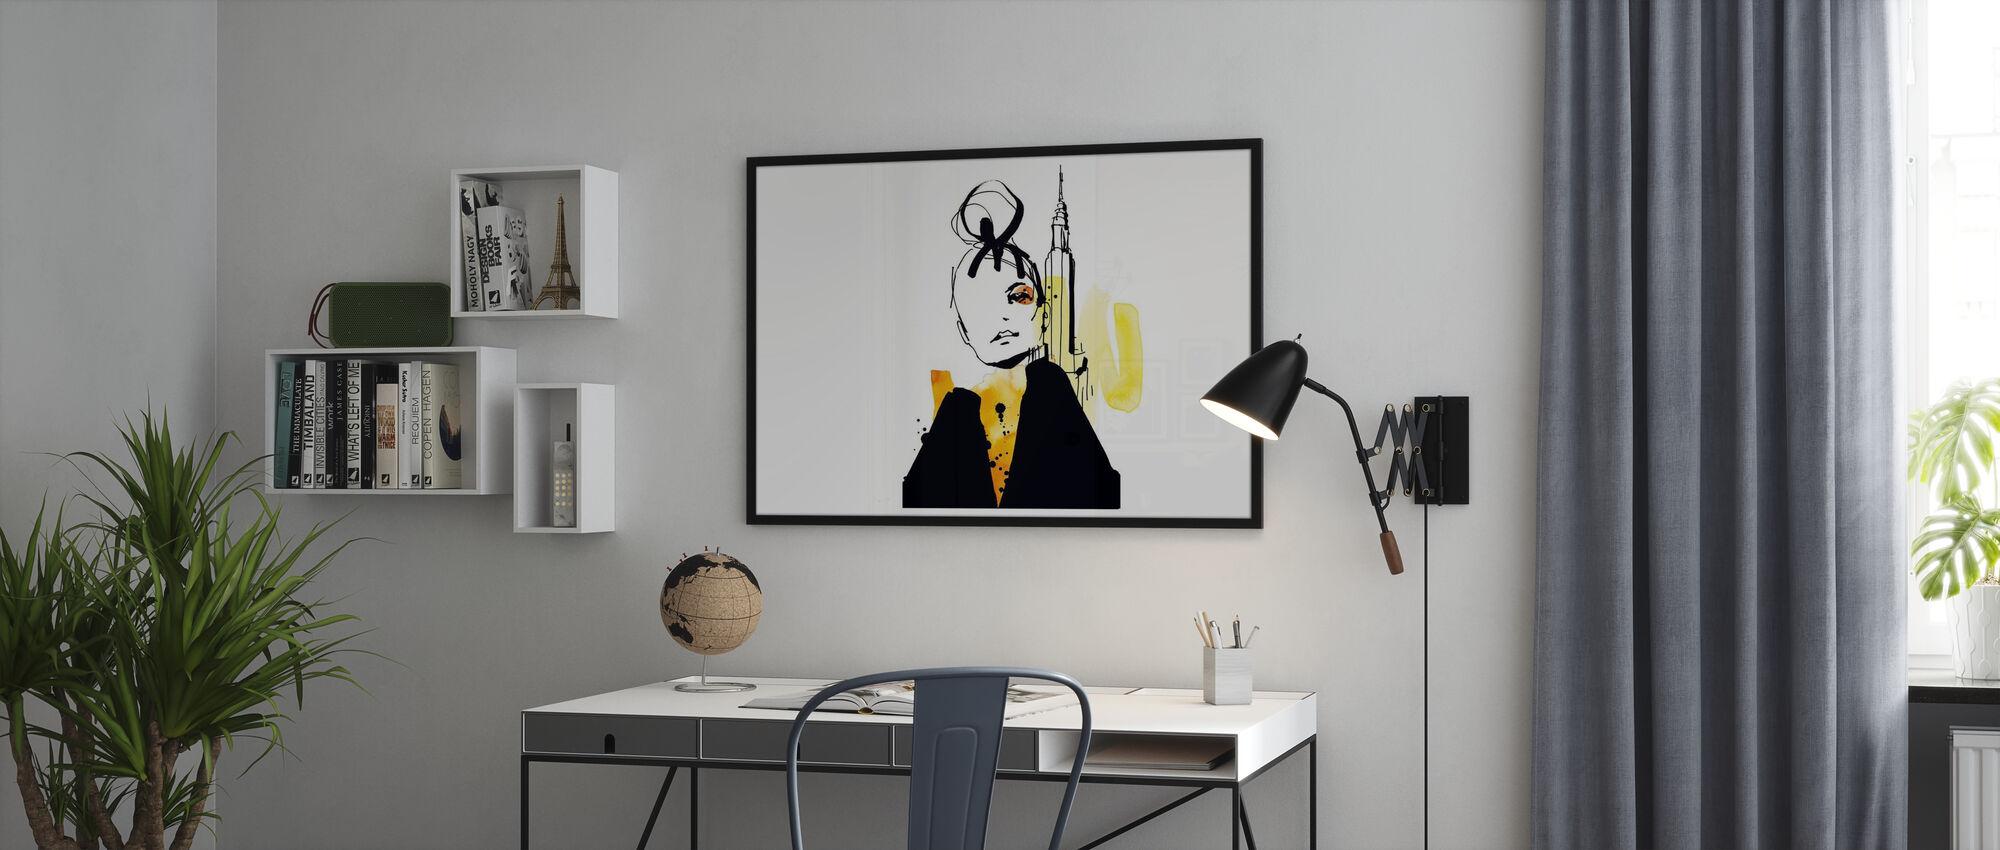 New York - Poster - Office